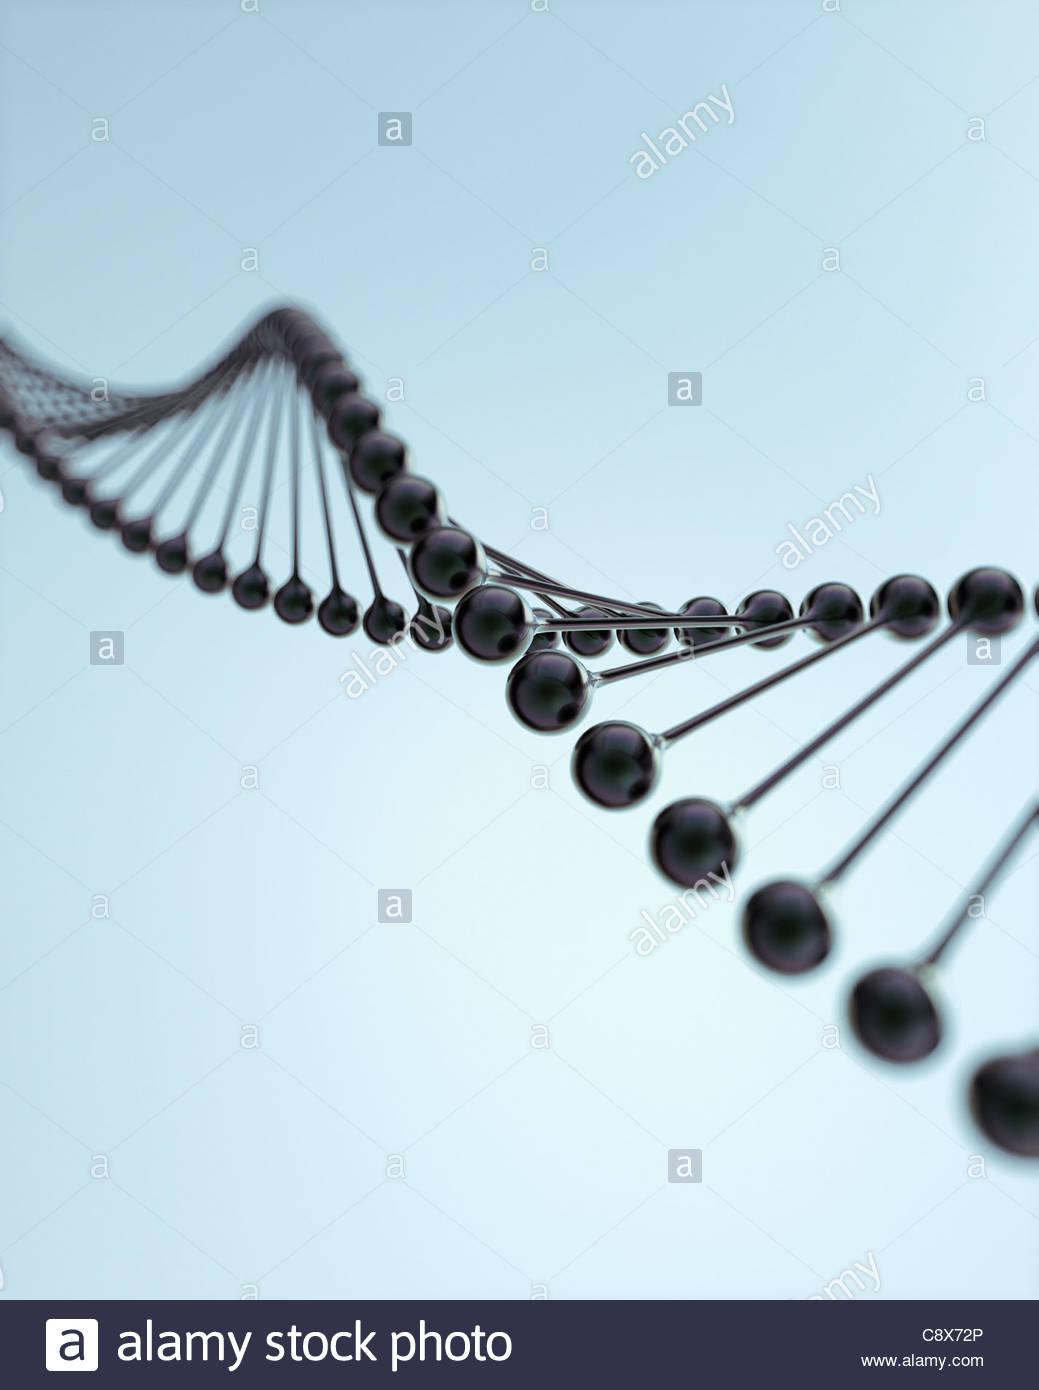 Cerca del modelo molecular de ADN Imagen De Stock